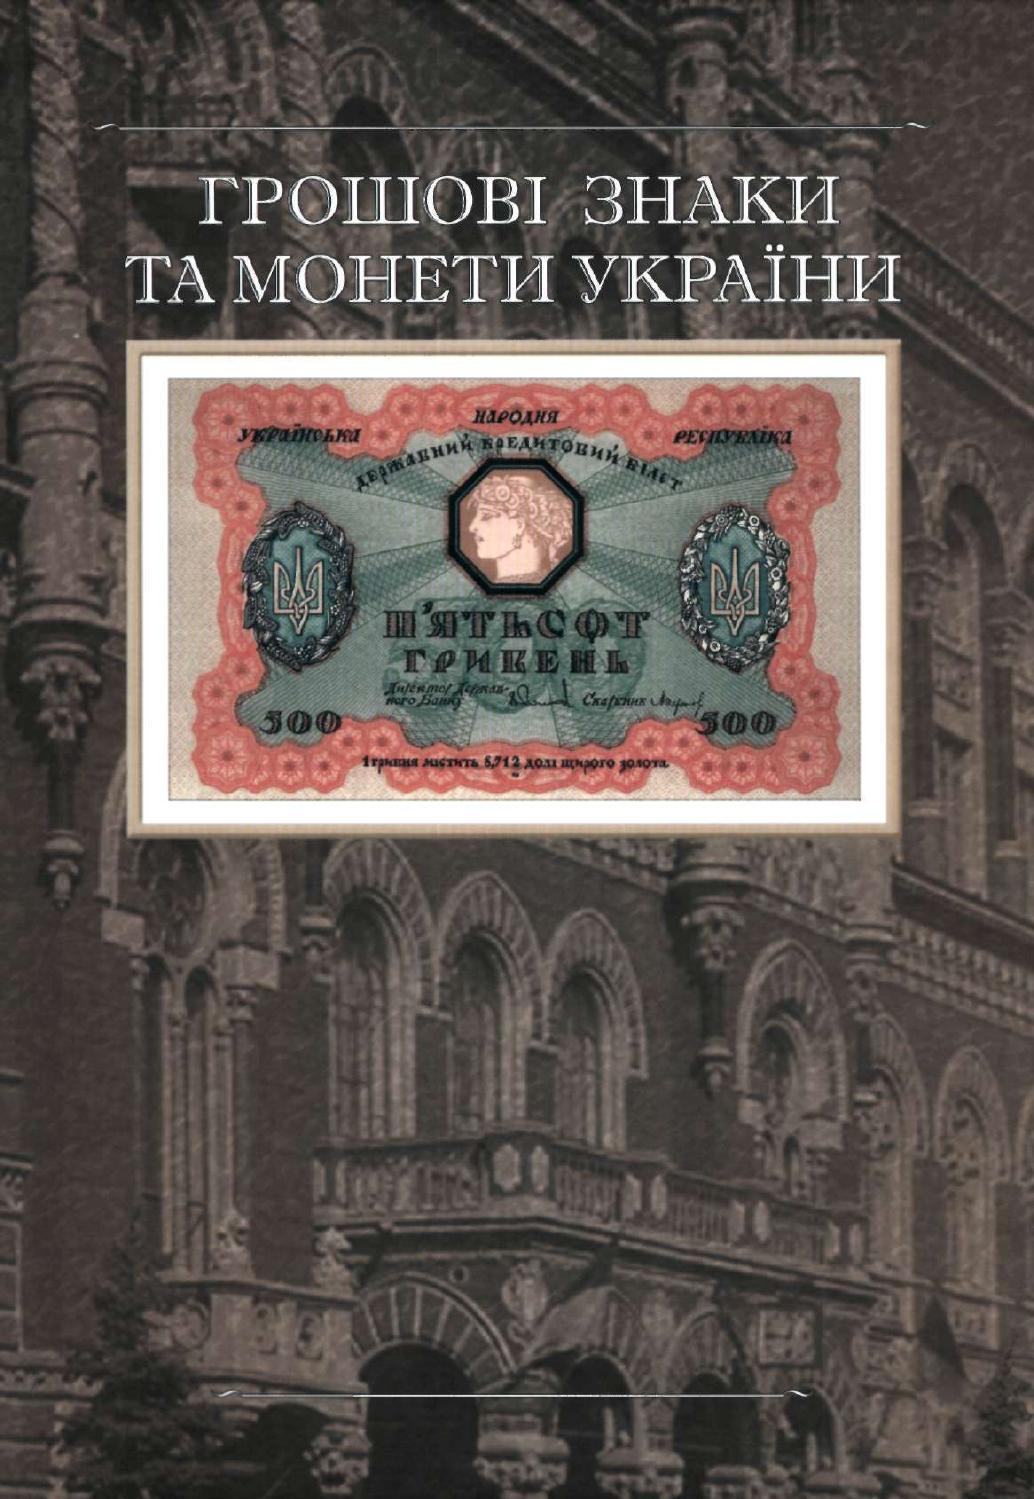 Грошові знаки та монети України by Watra - issuu 34e4fc00c24fb